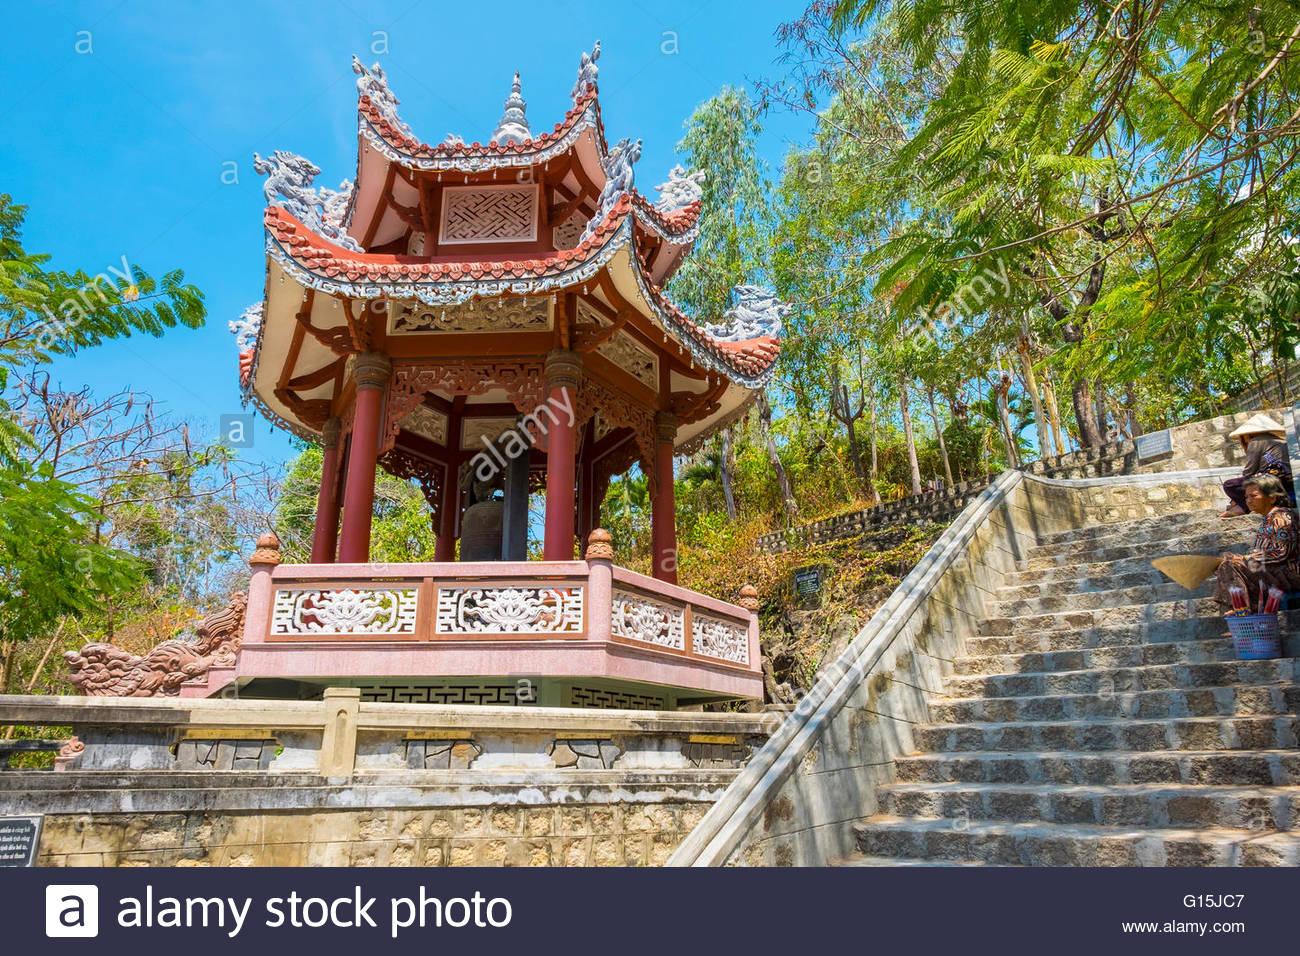 Small pagoda at Chua Long Son Buddhist temple, Nha Trang, Khanh Hoa Province, Vietnam, Indochina, Southeast Asia, Stock Photo